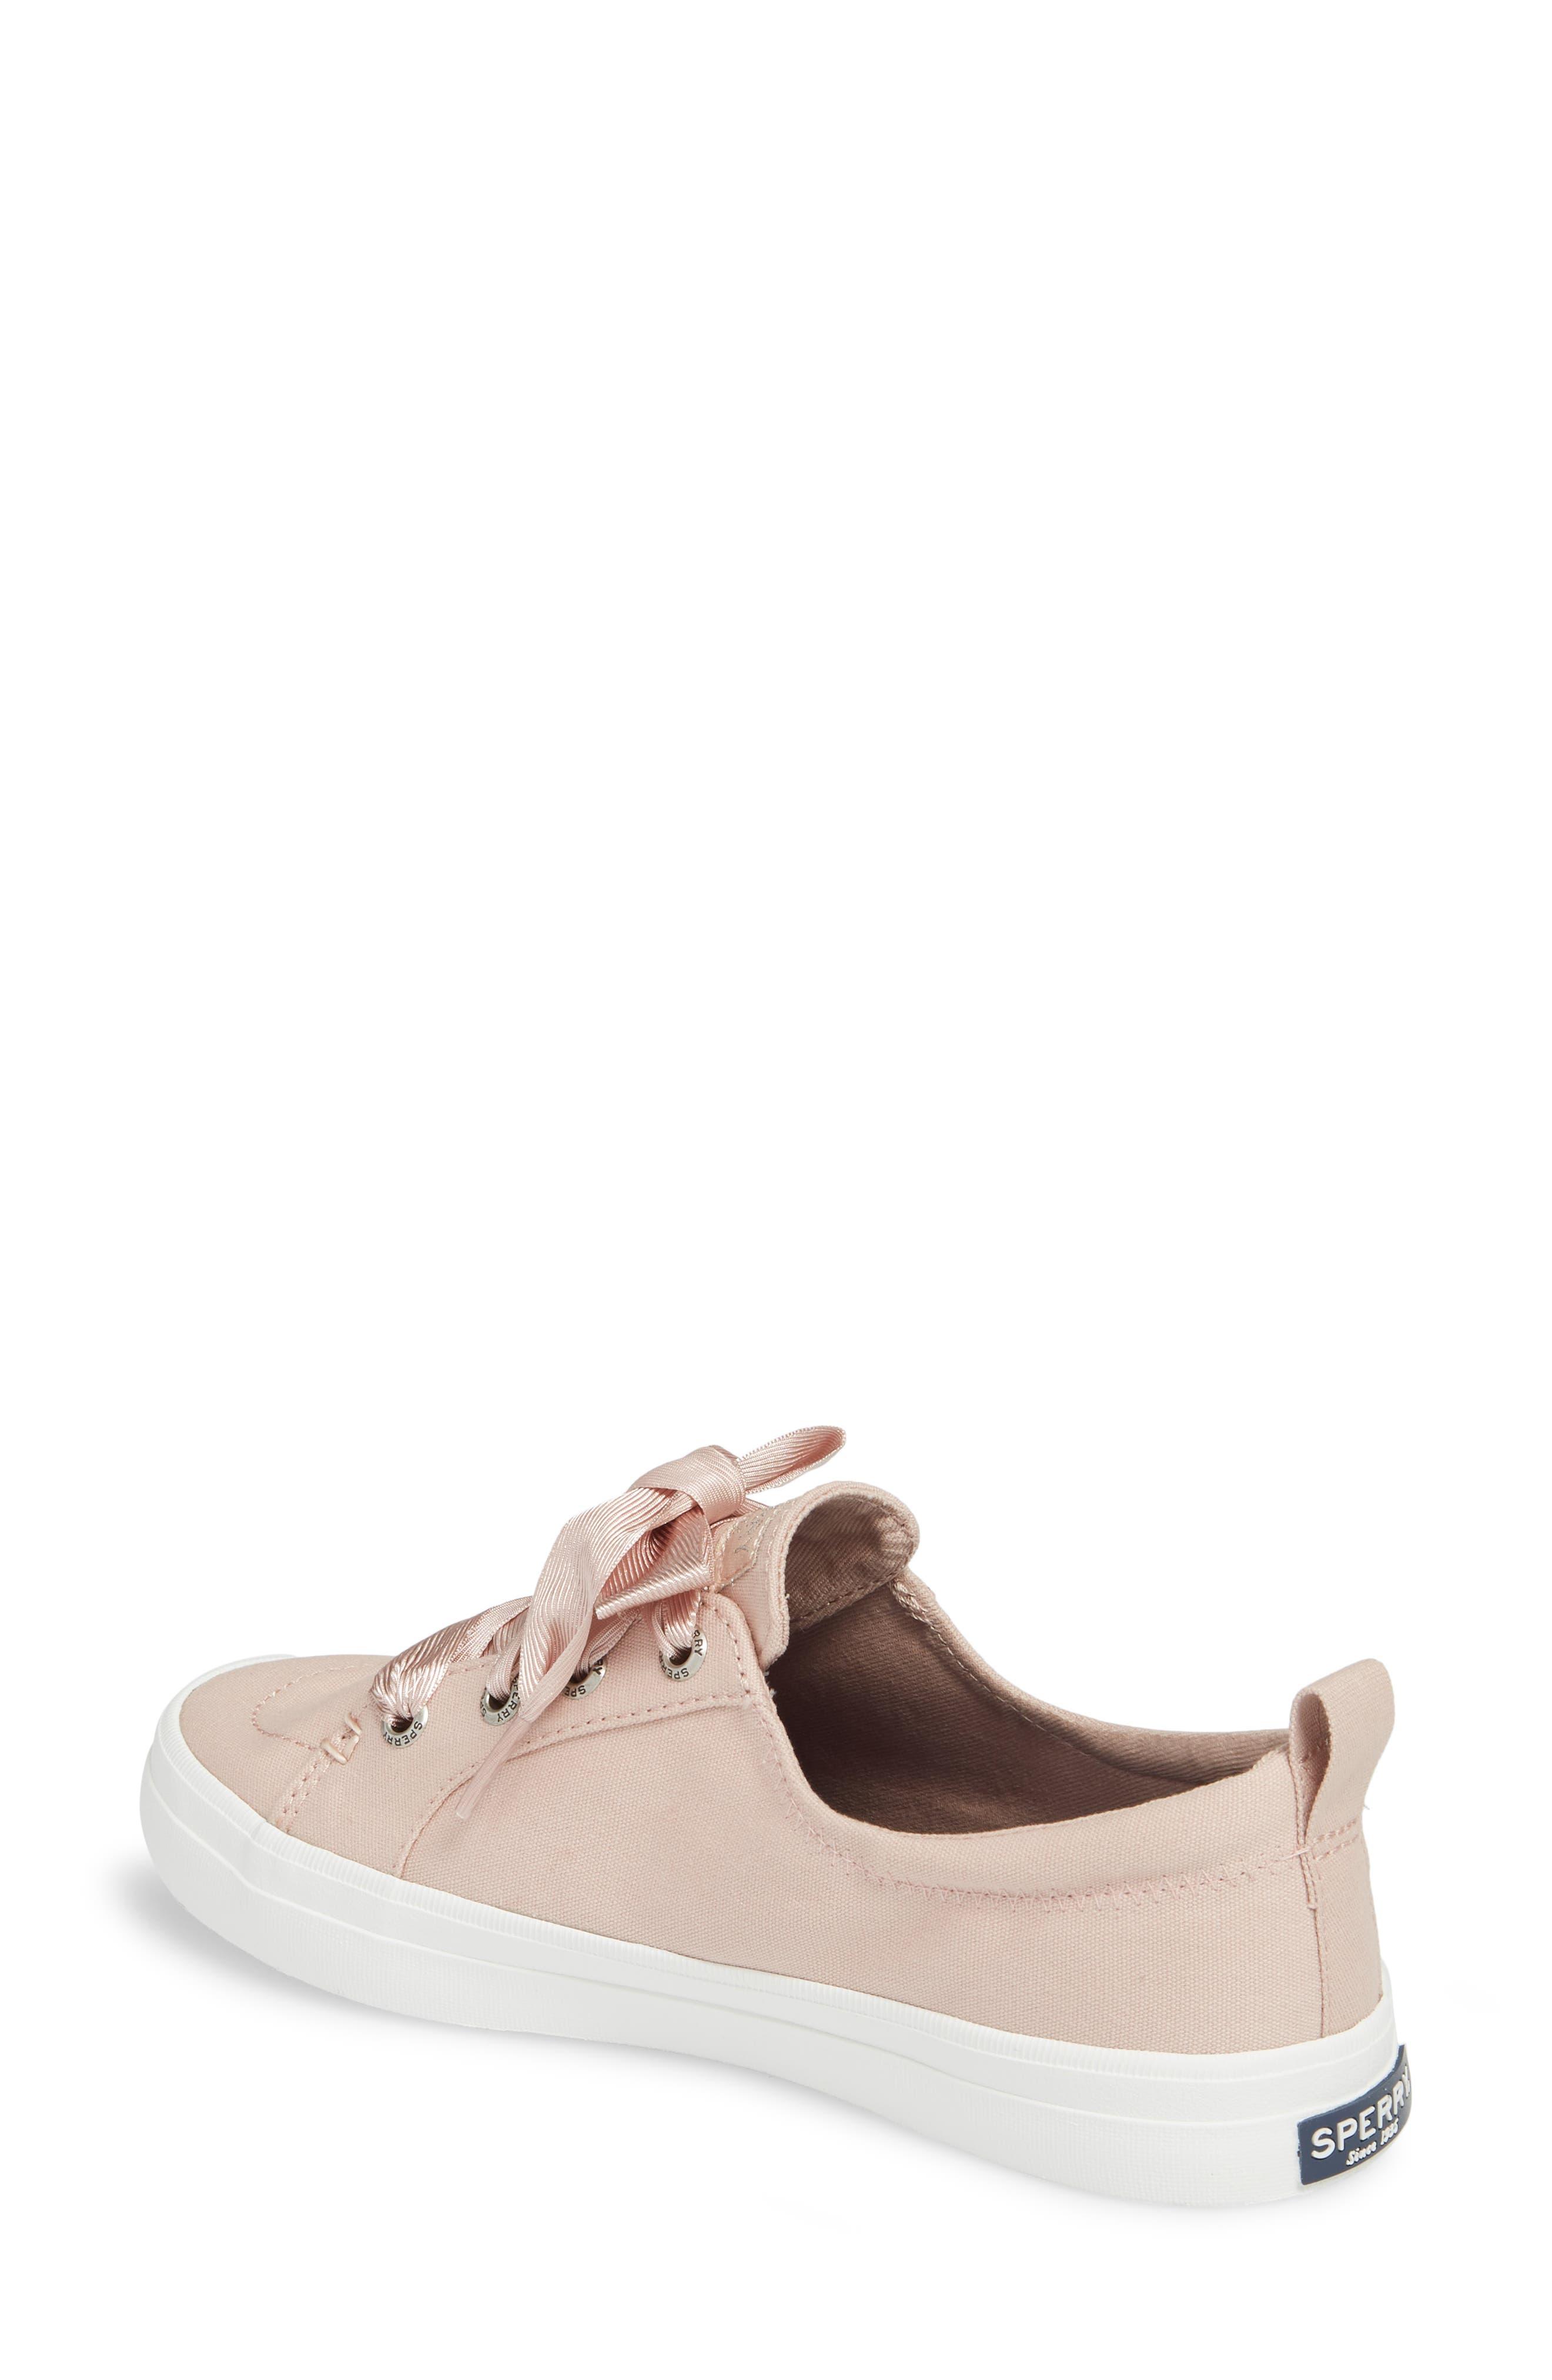 Crest Vibe Satin Lace Sneaker,                             Alternate thumbnail 2, color,                             Rose Dust Canvas